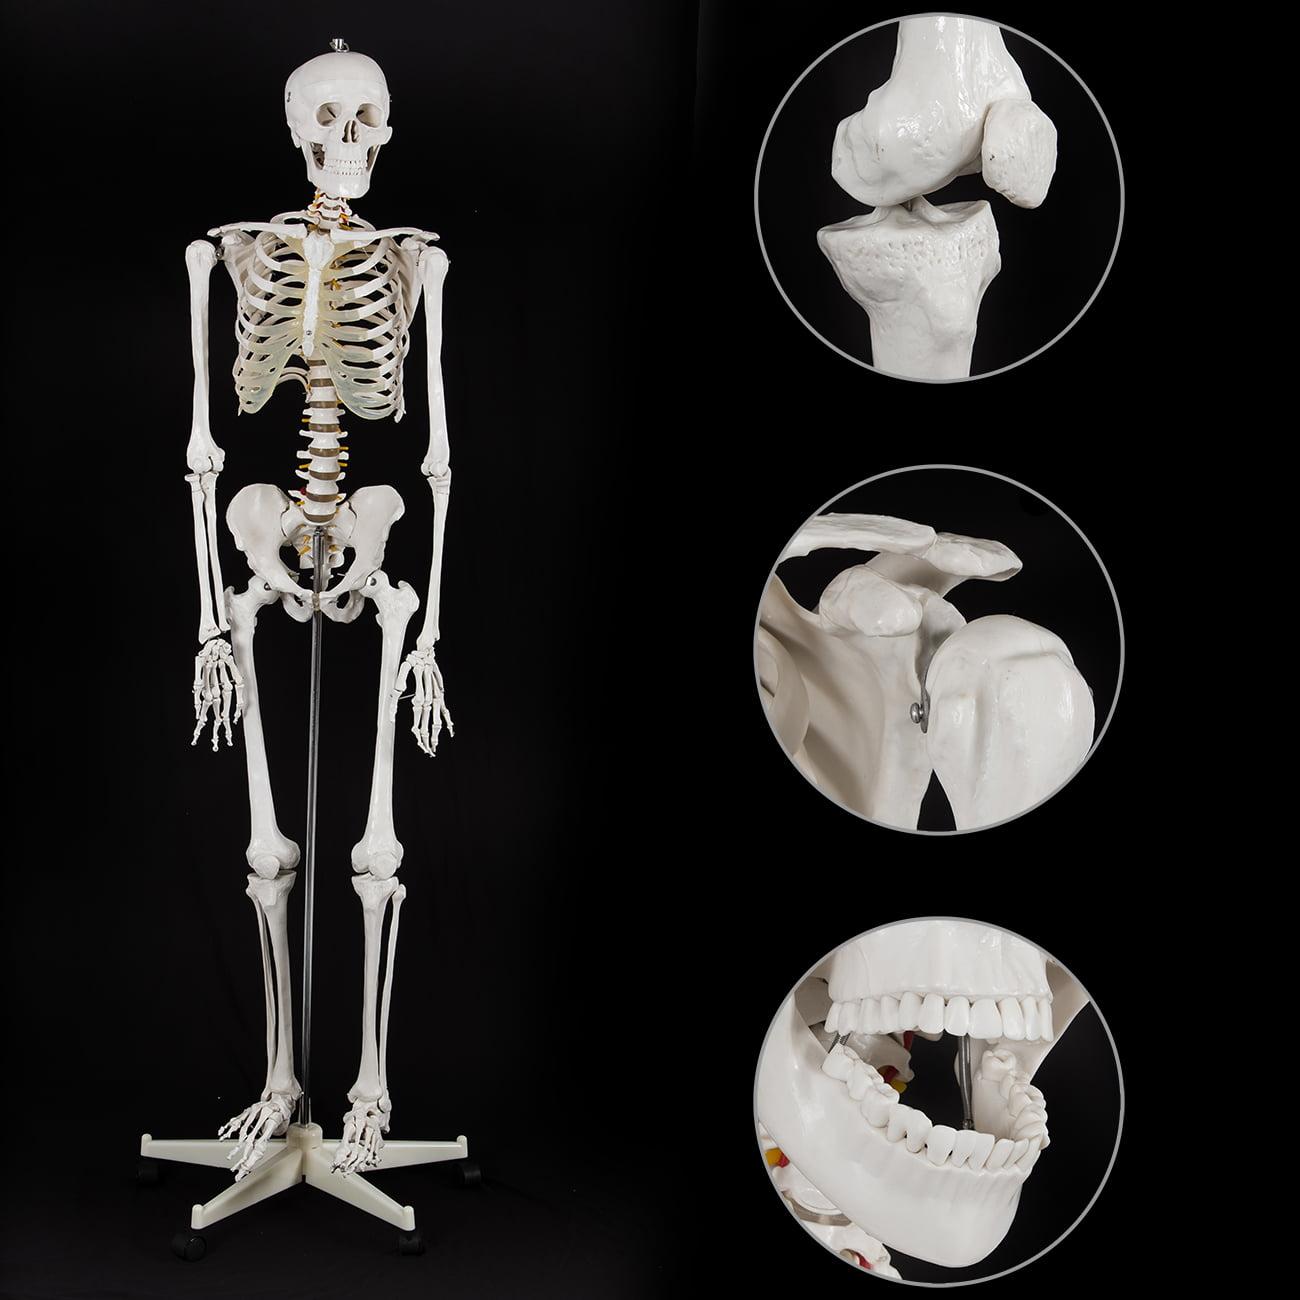 Onebigoutlet Life Size Human Anatomical Study Anatomy Skeleton